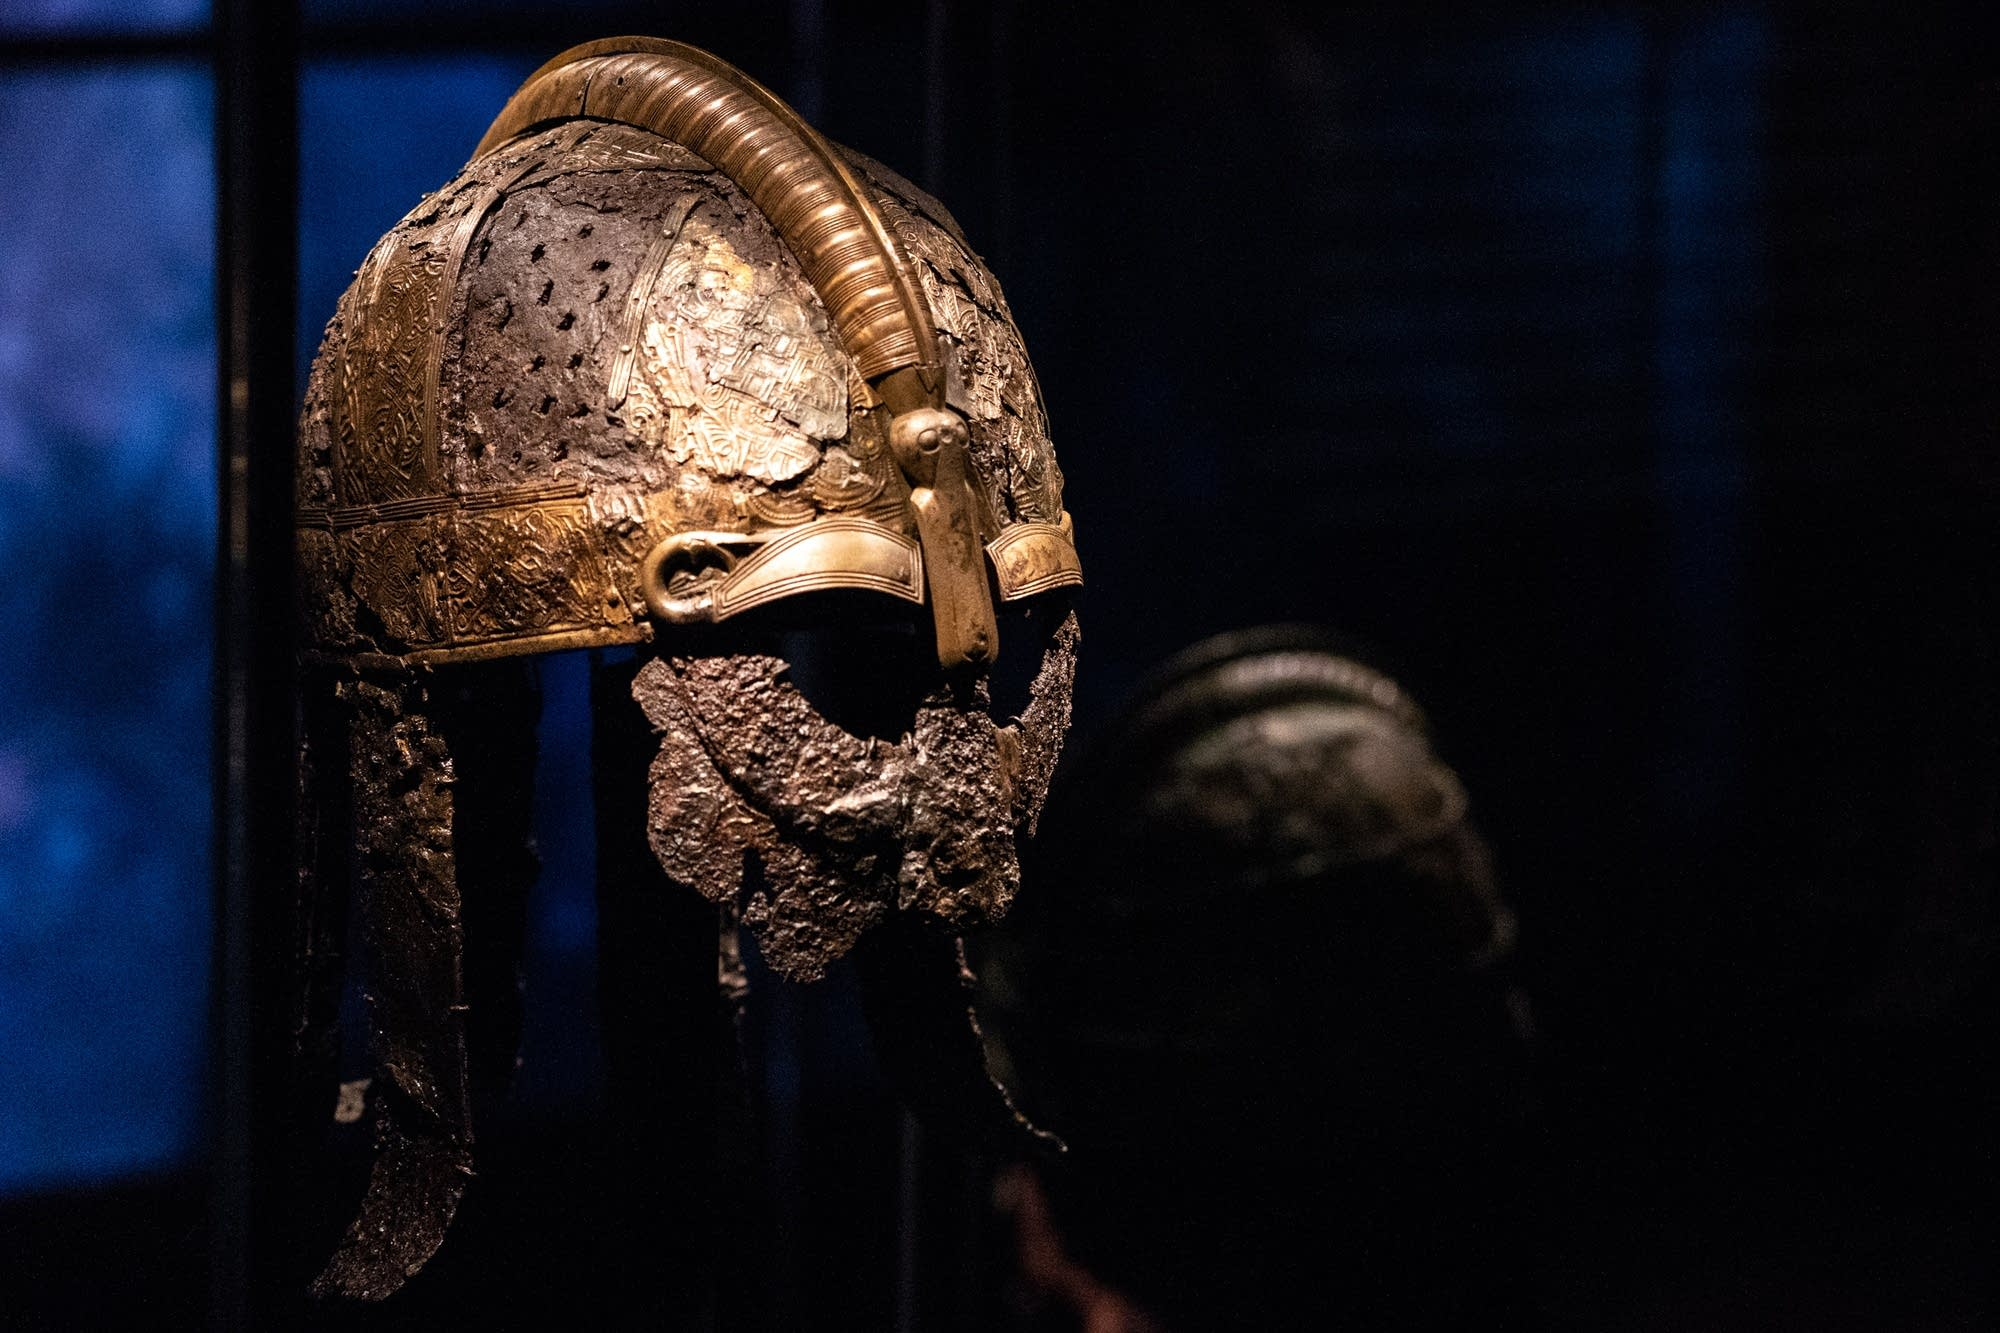 A Viking battle helmet sits on display.